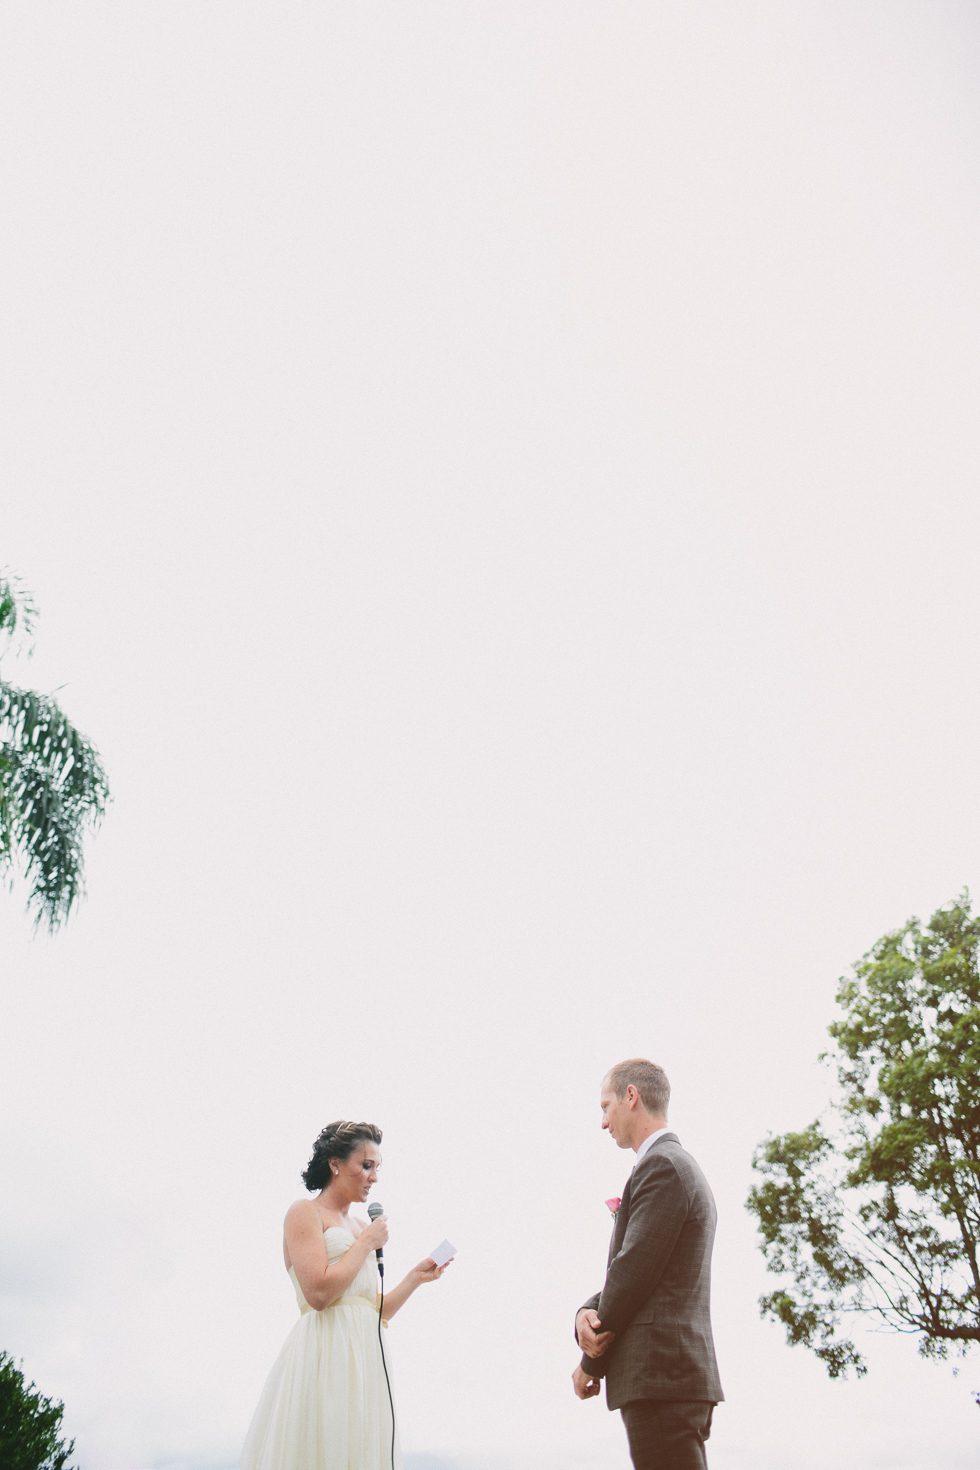 Beautiful outdoor wedding in Brazil   Photos by Frankie & Marilia (19)